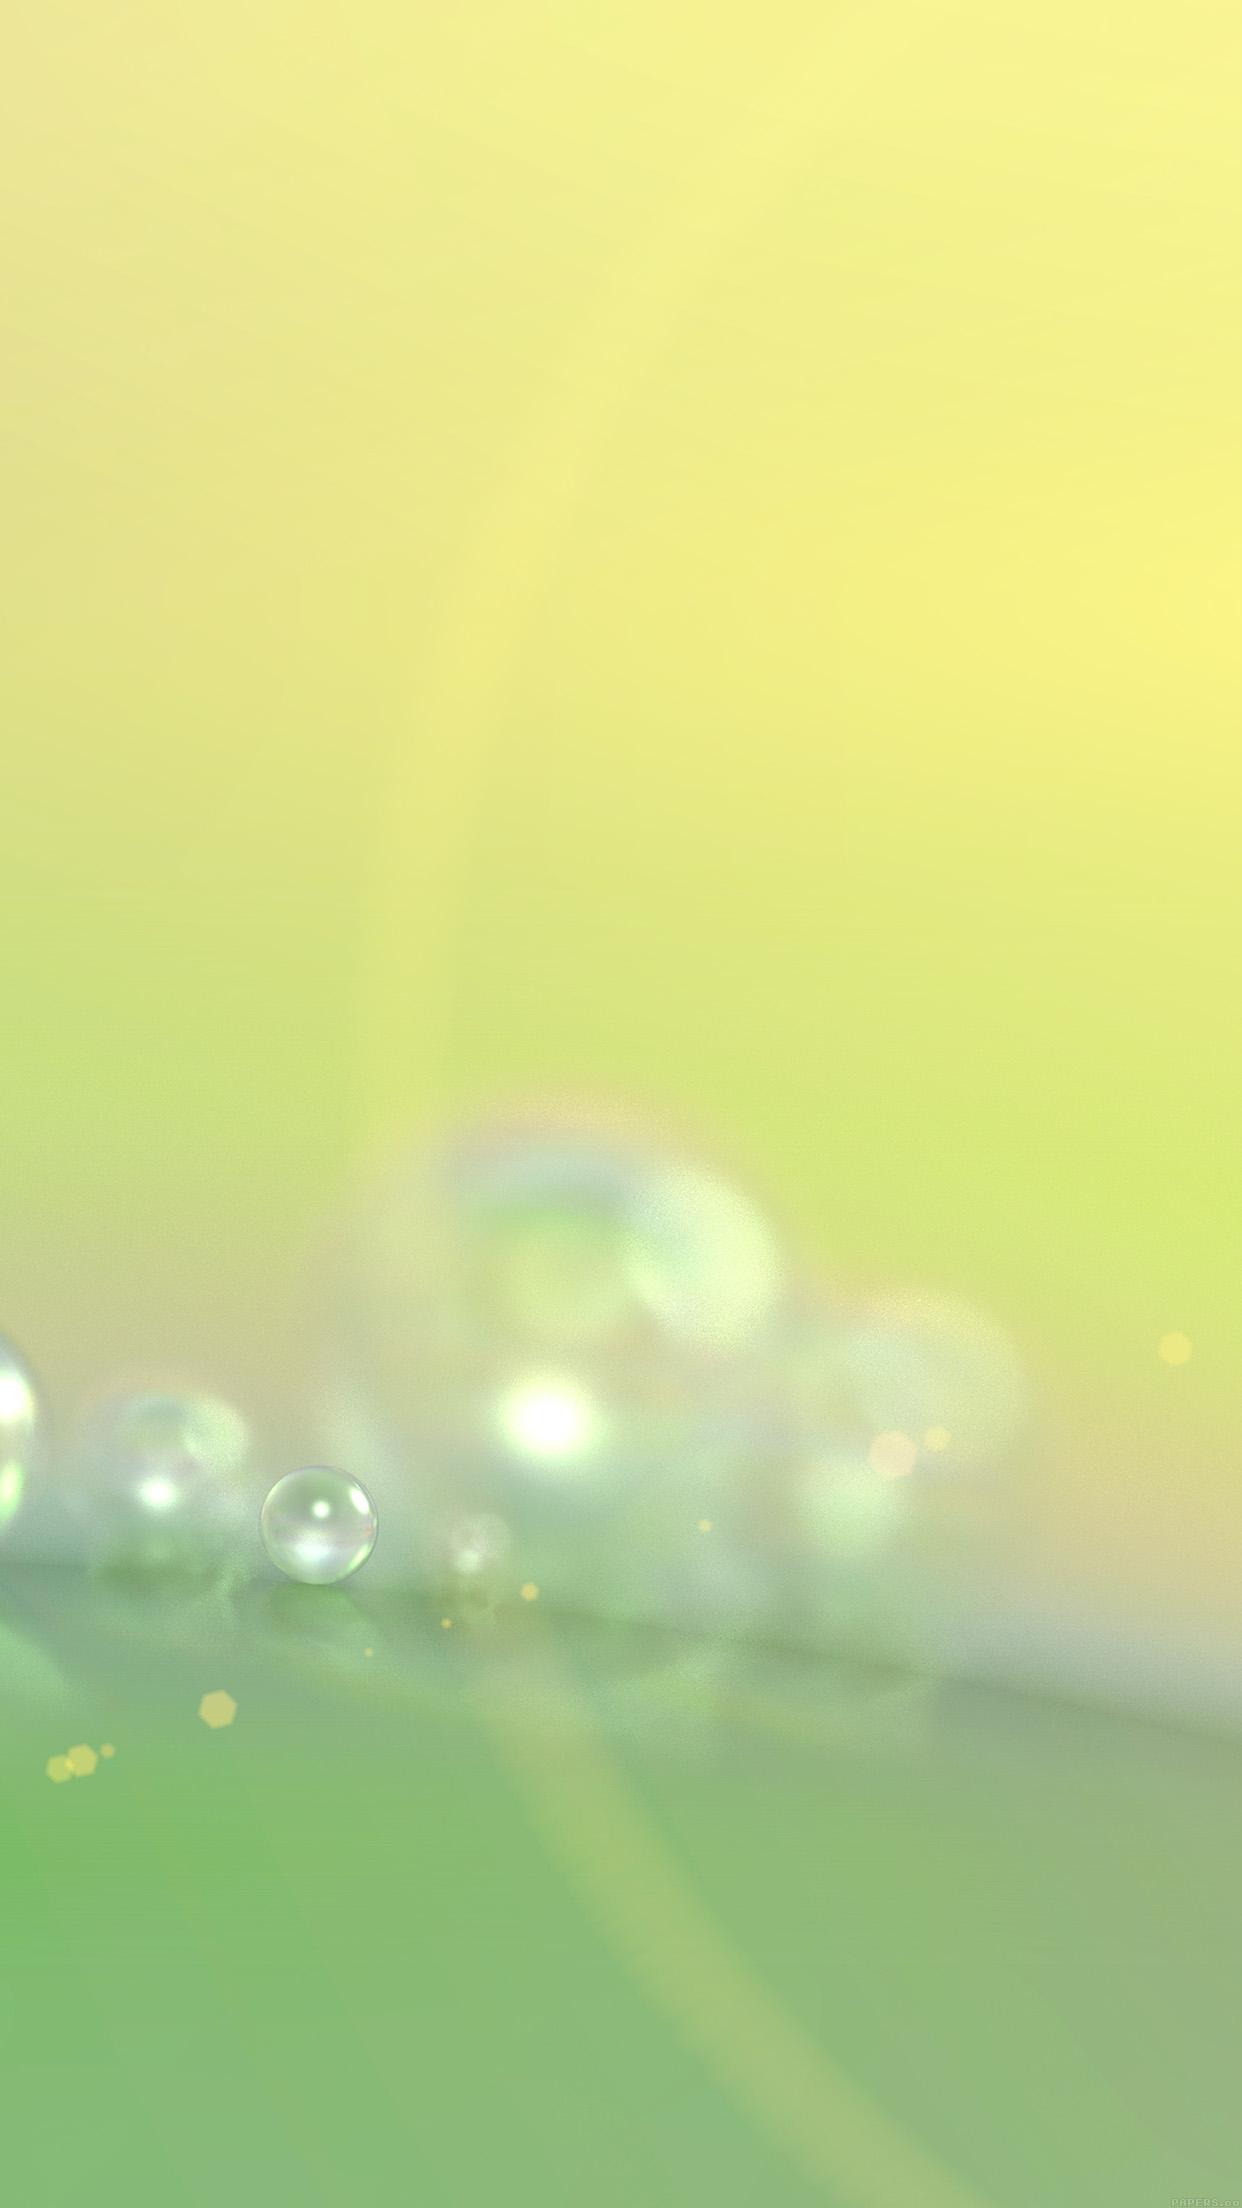 i love papers | vg73-rain-morning-dew-drop-green-blur-pattern